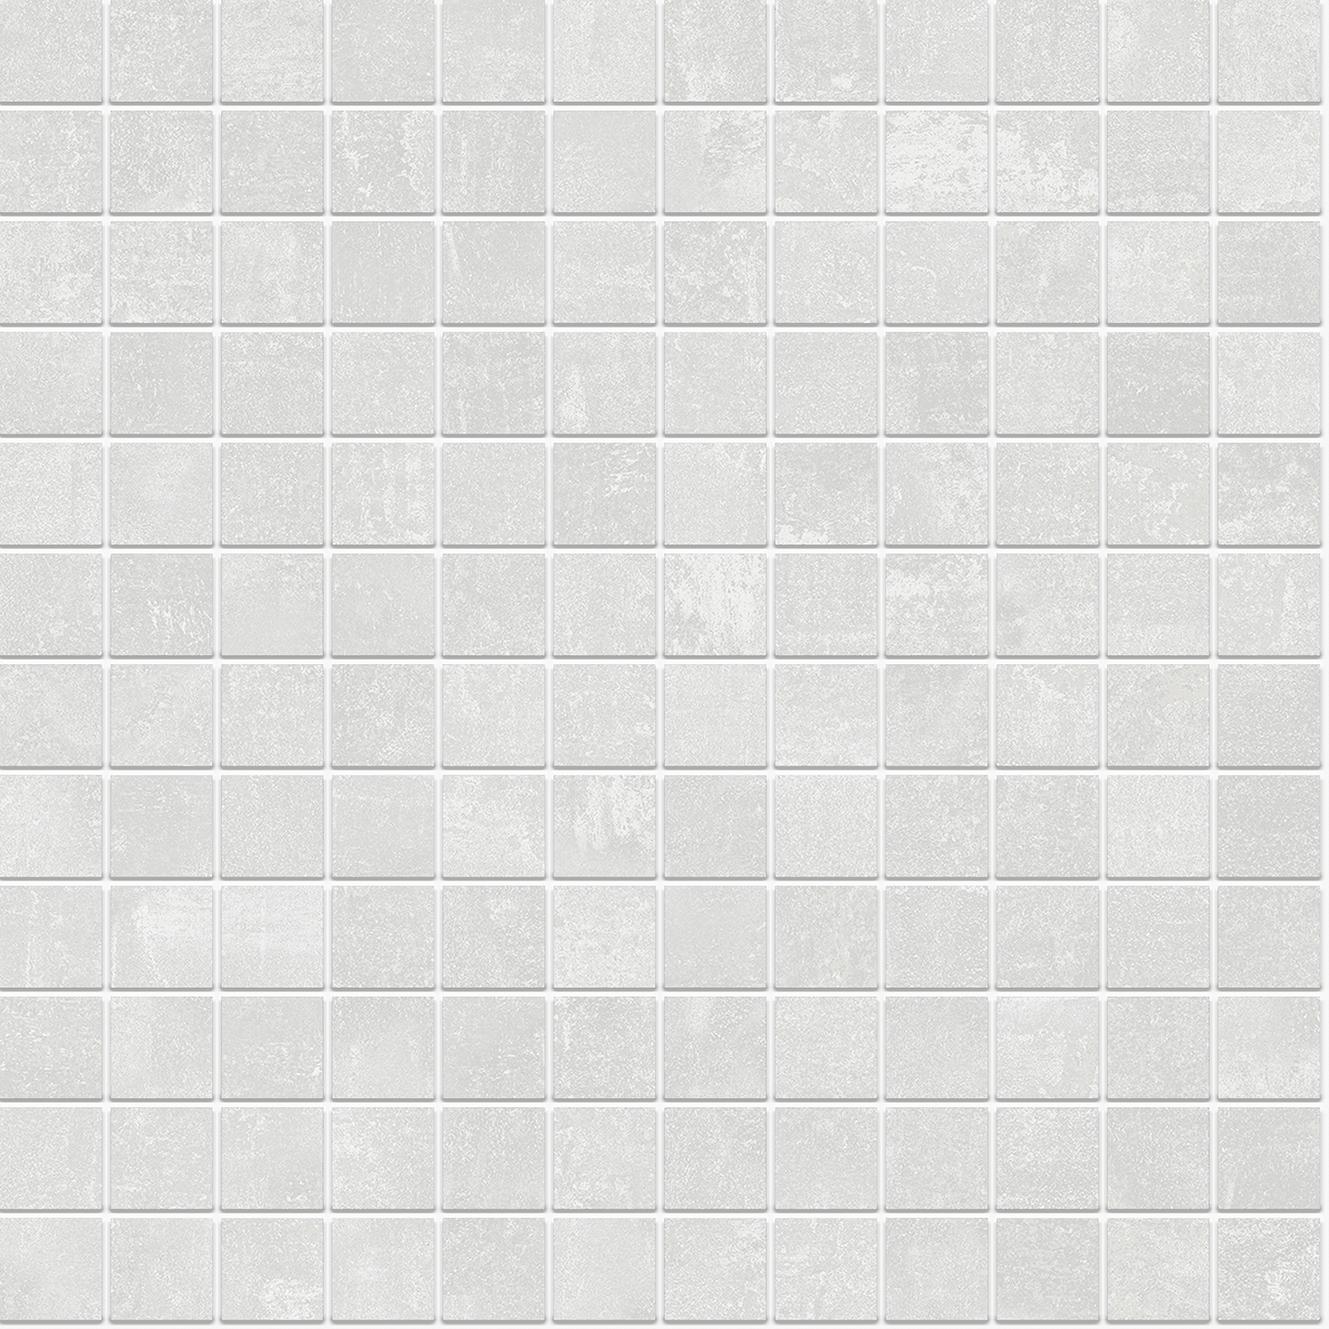 Mosaique Bianco